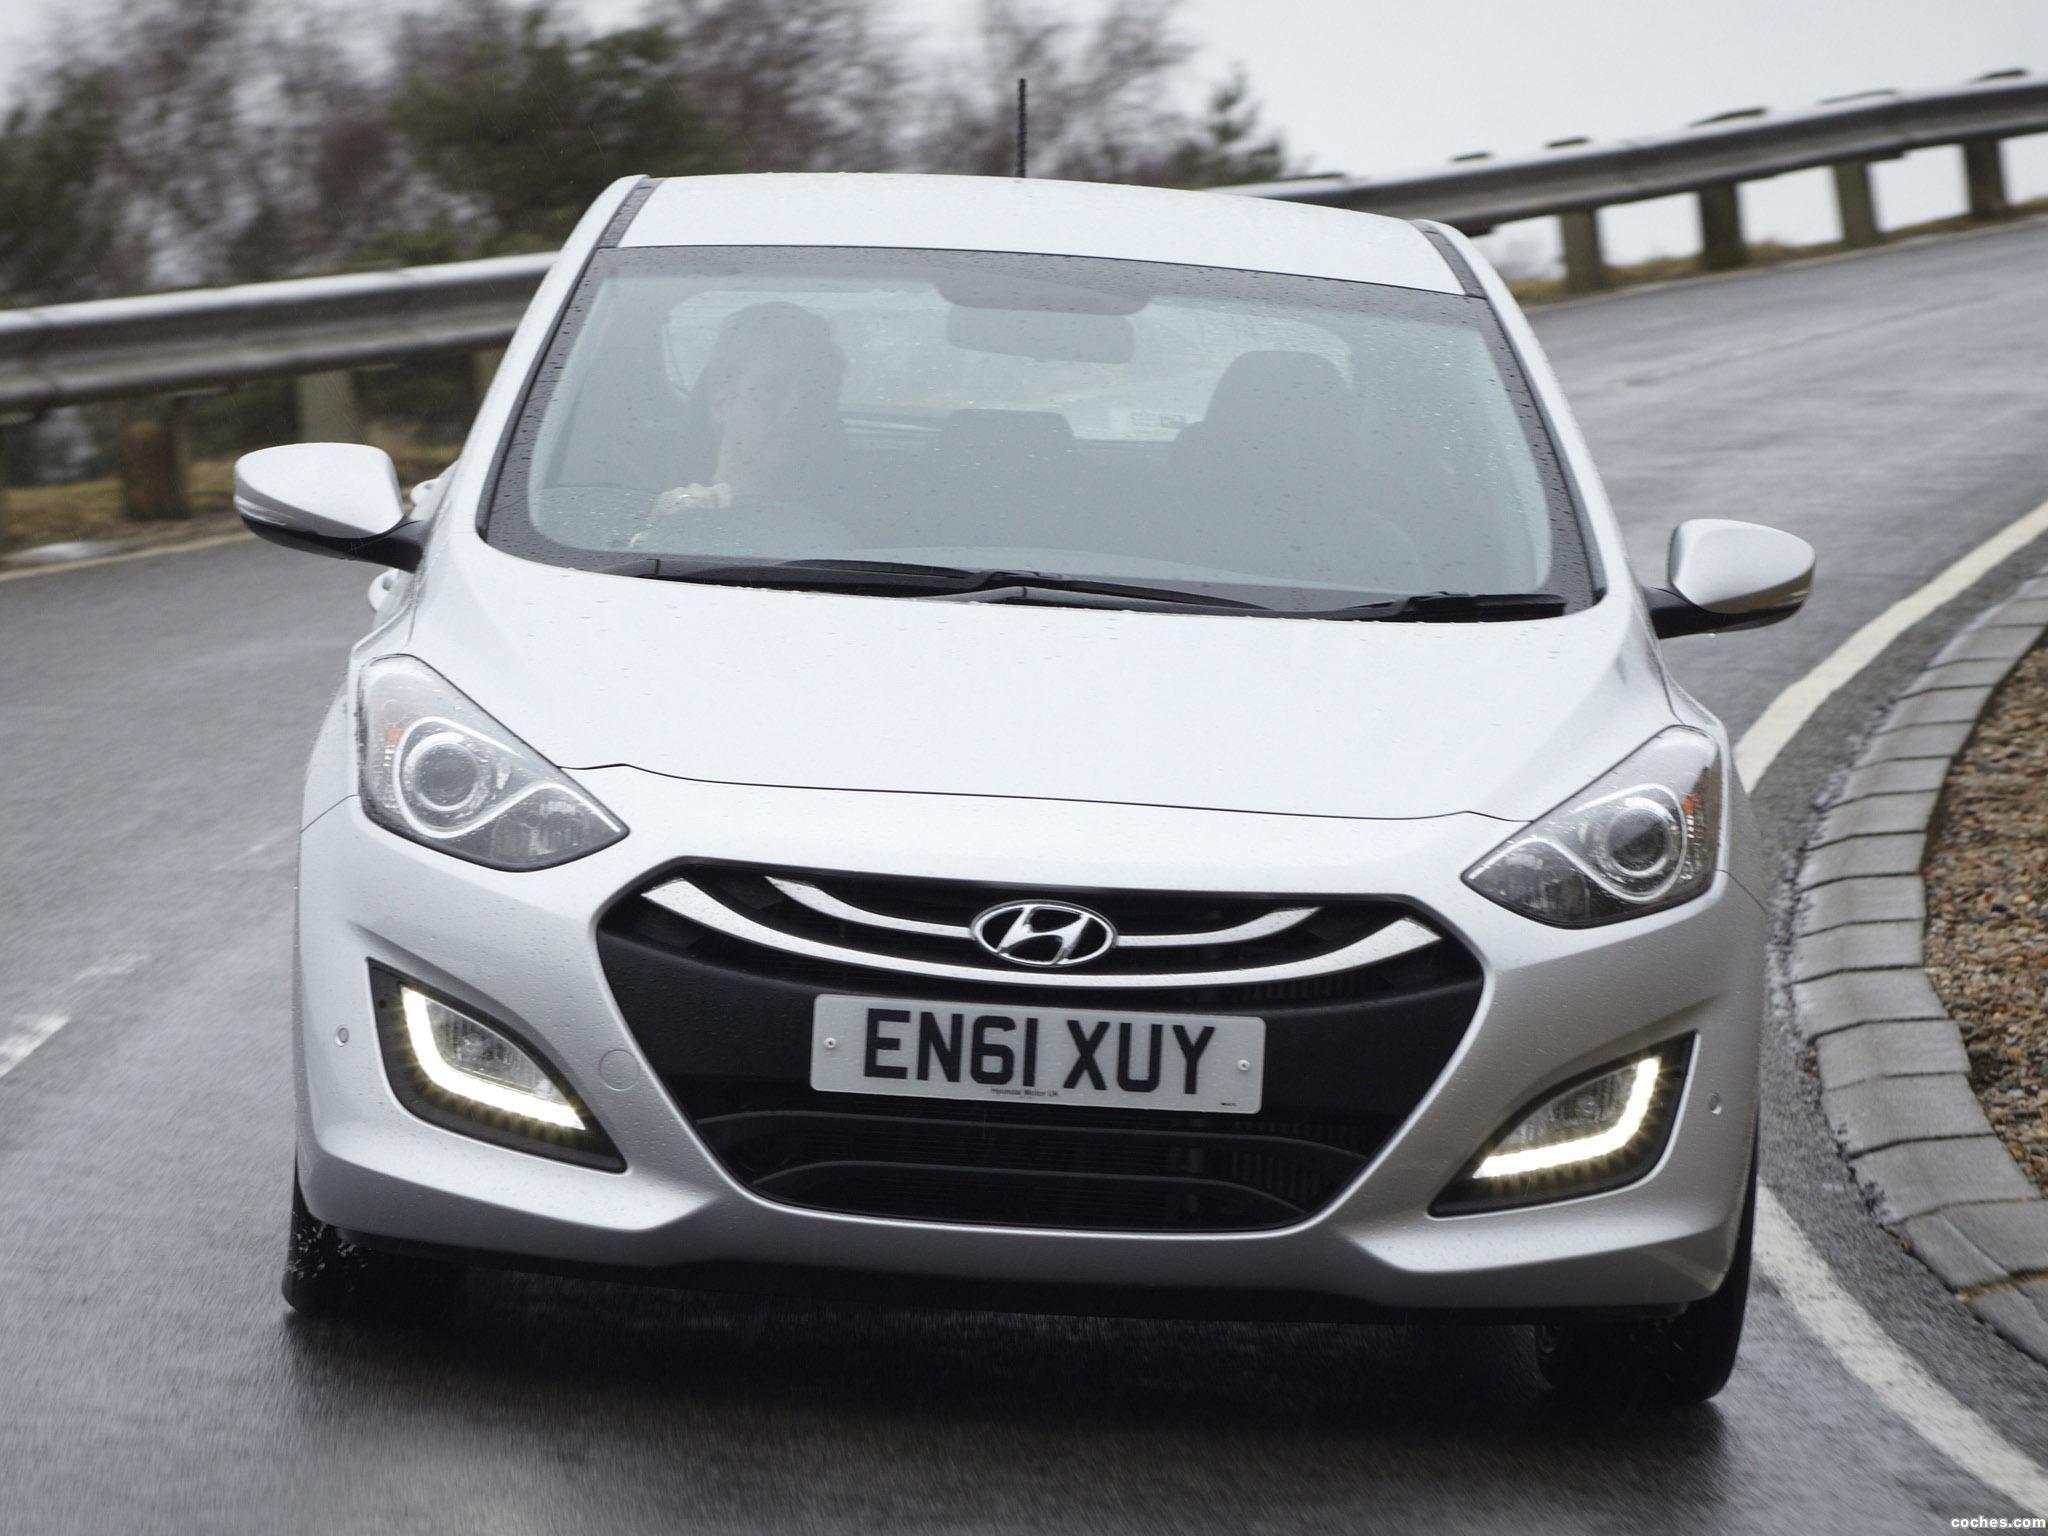 Foto 9 de Hyundai I30 UK 2012 5 puertas